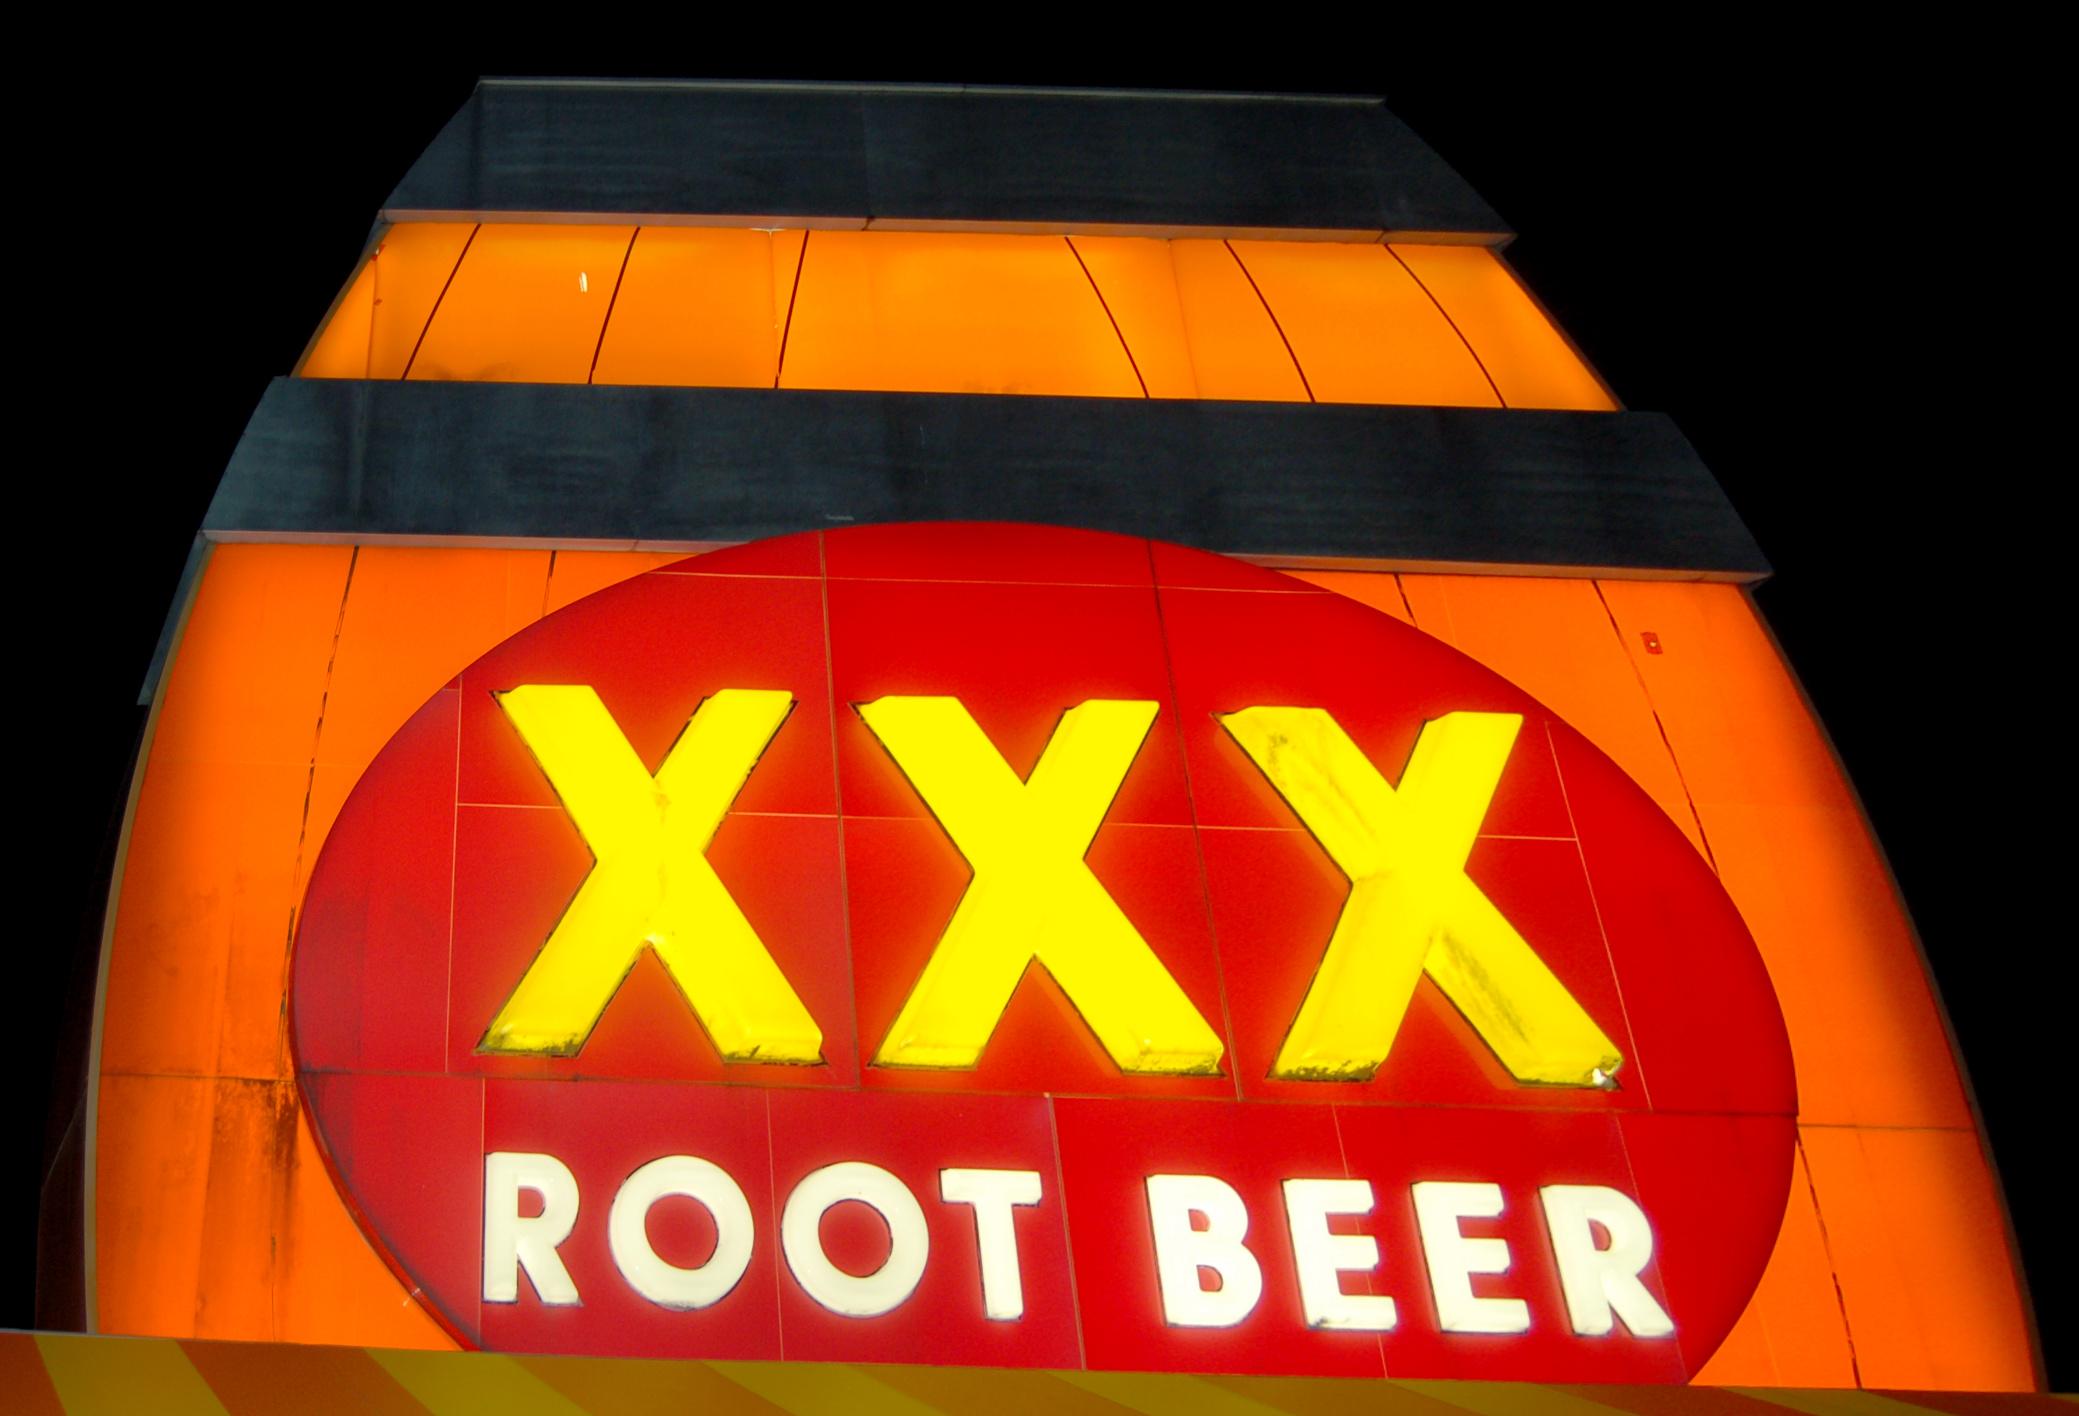 Triple xxx rootbeer